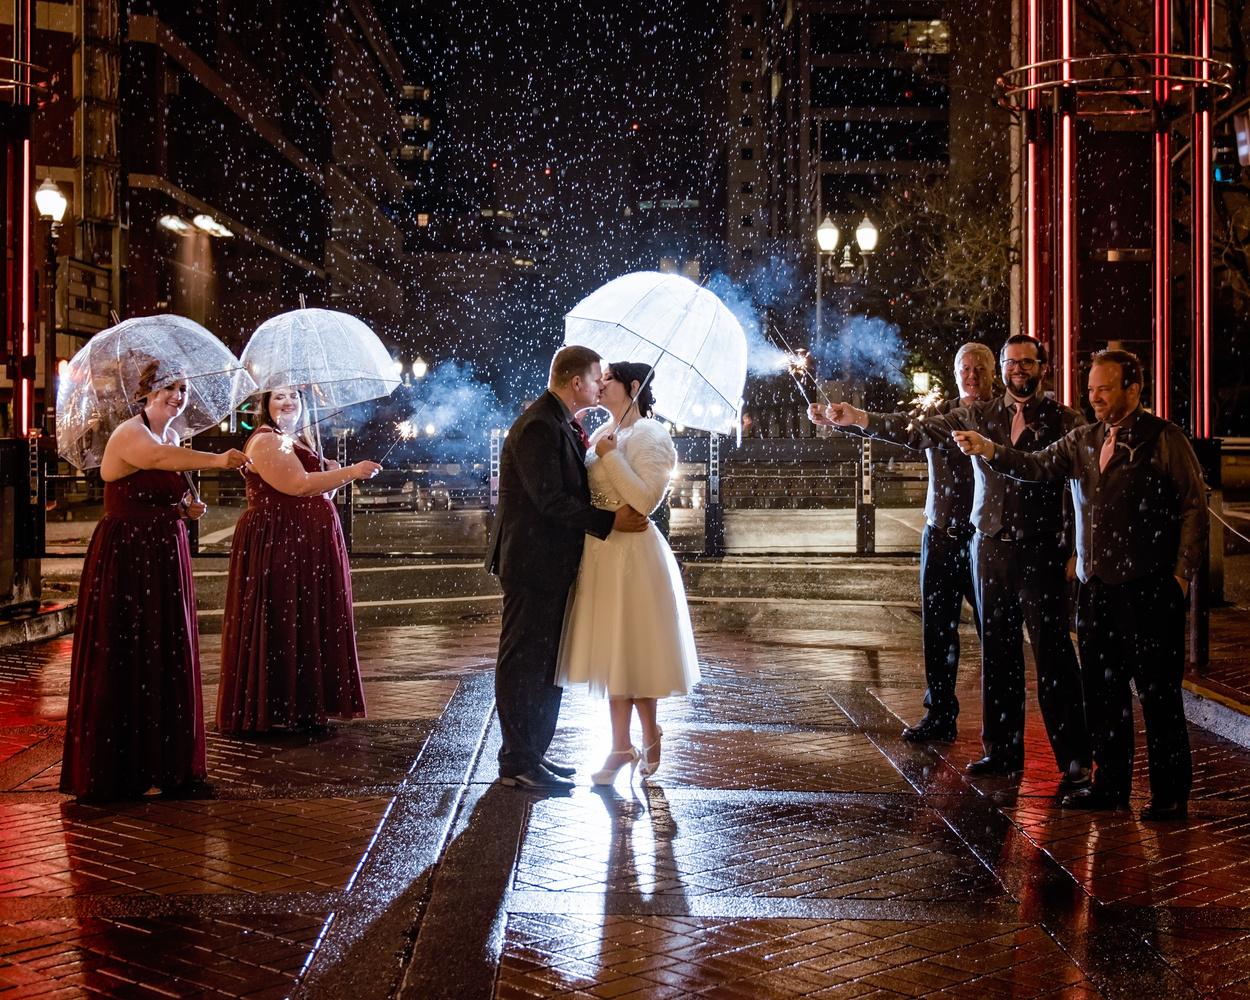 A Typical Wedding in Portland by Missy Fant